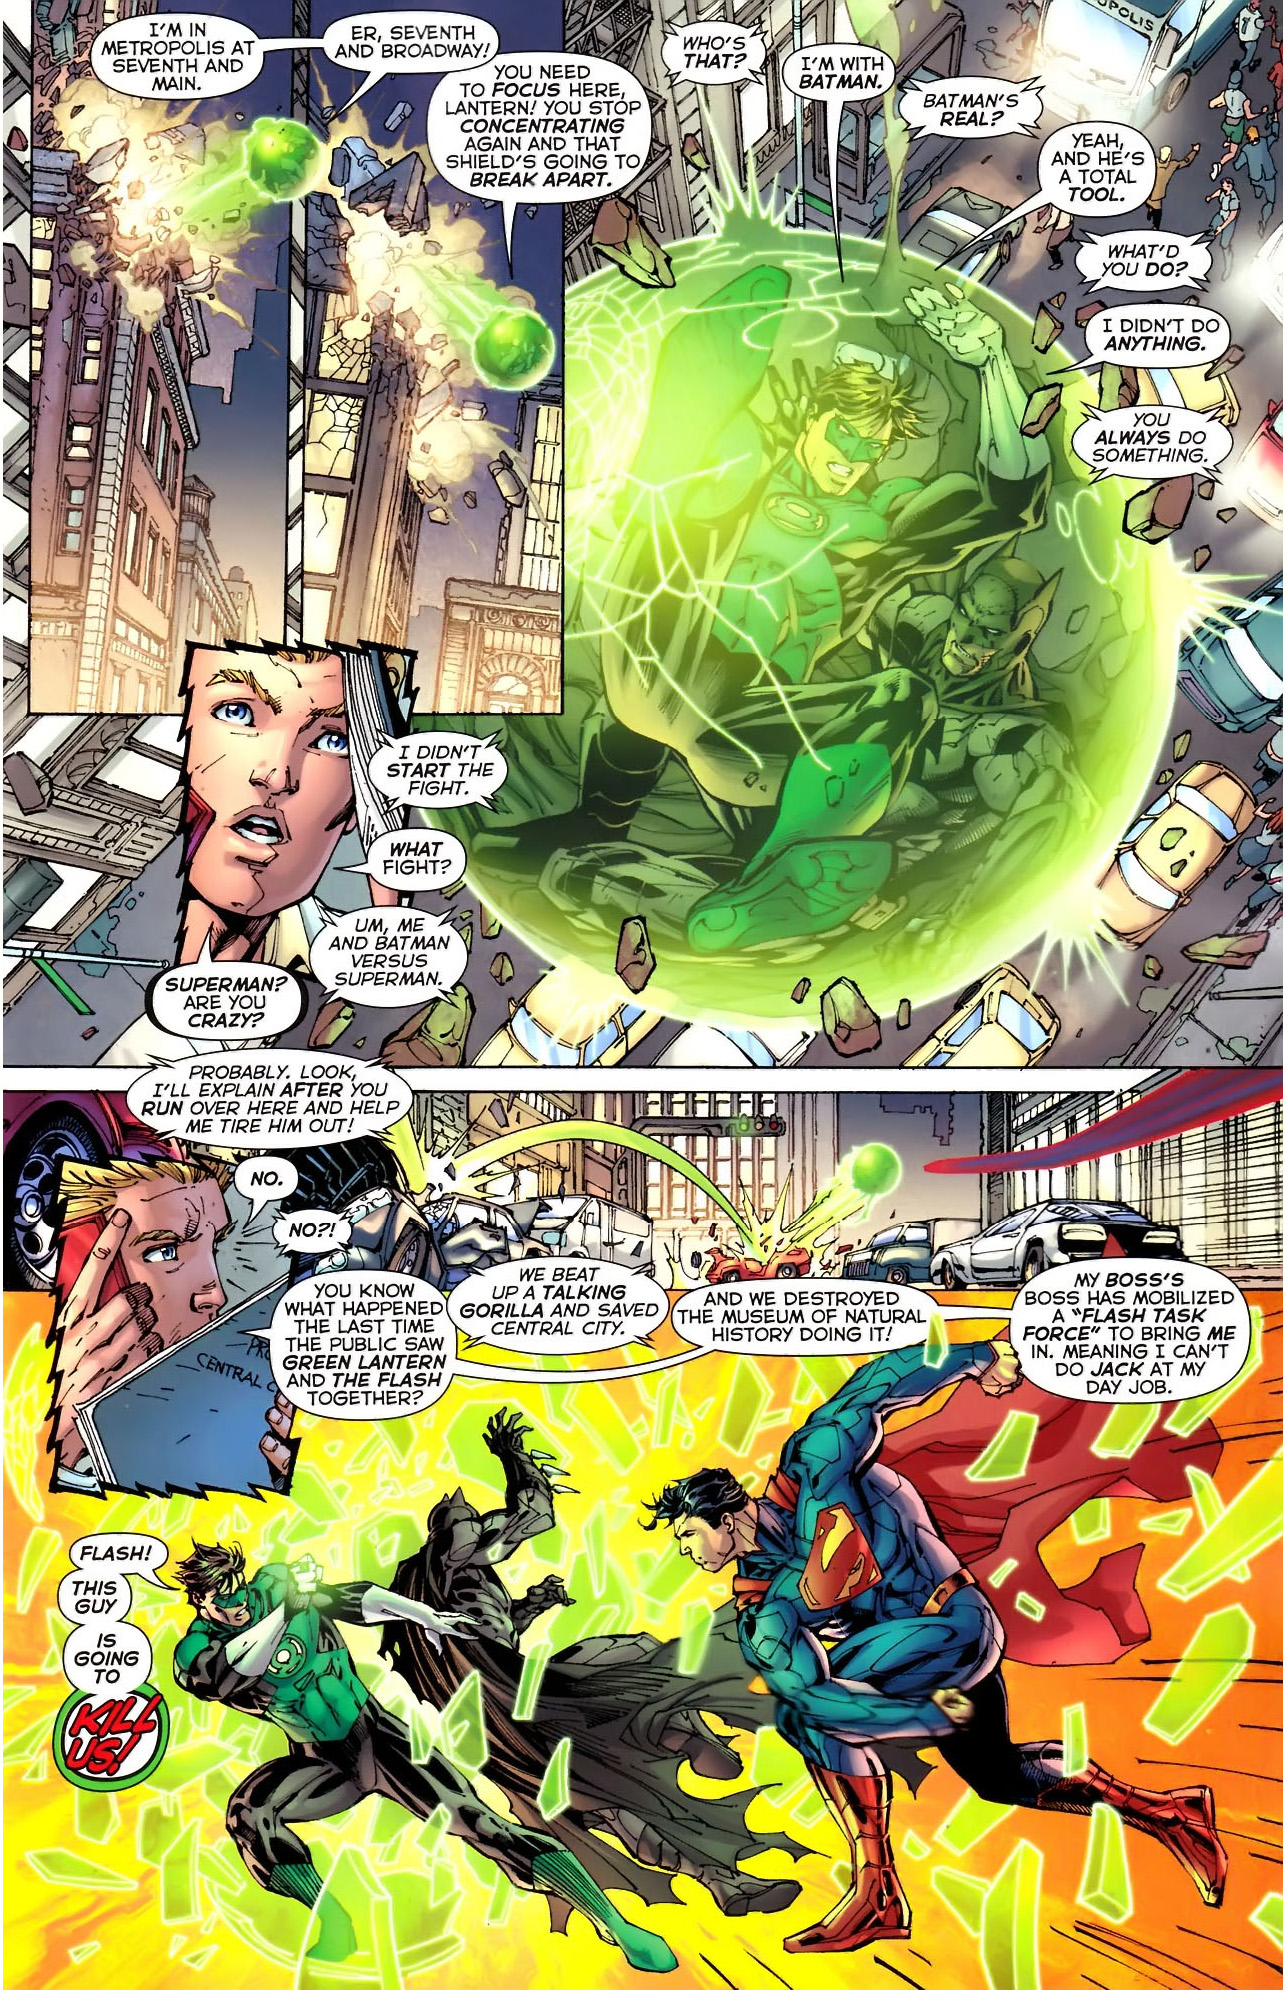 superman vs green lantern (new 52)